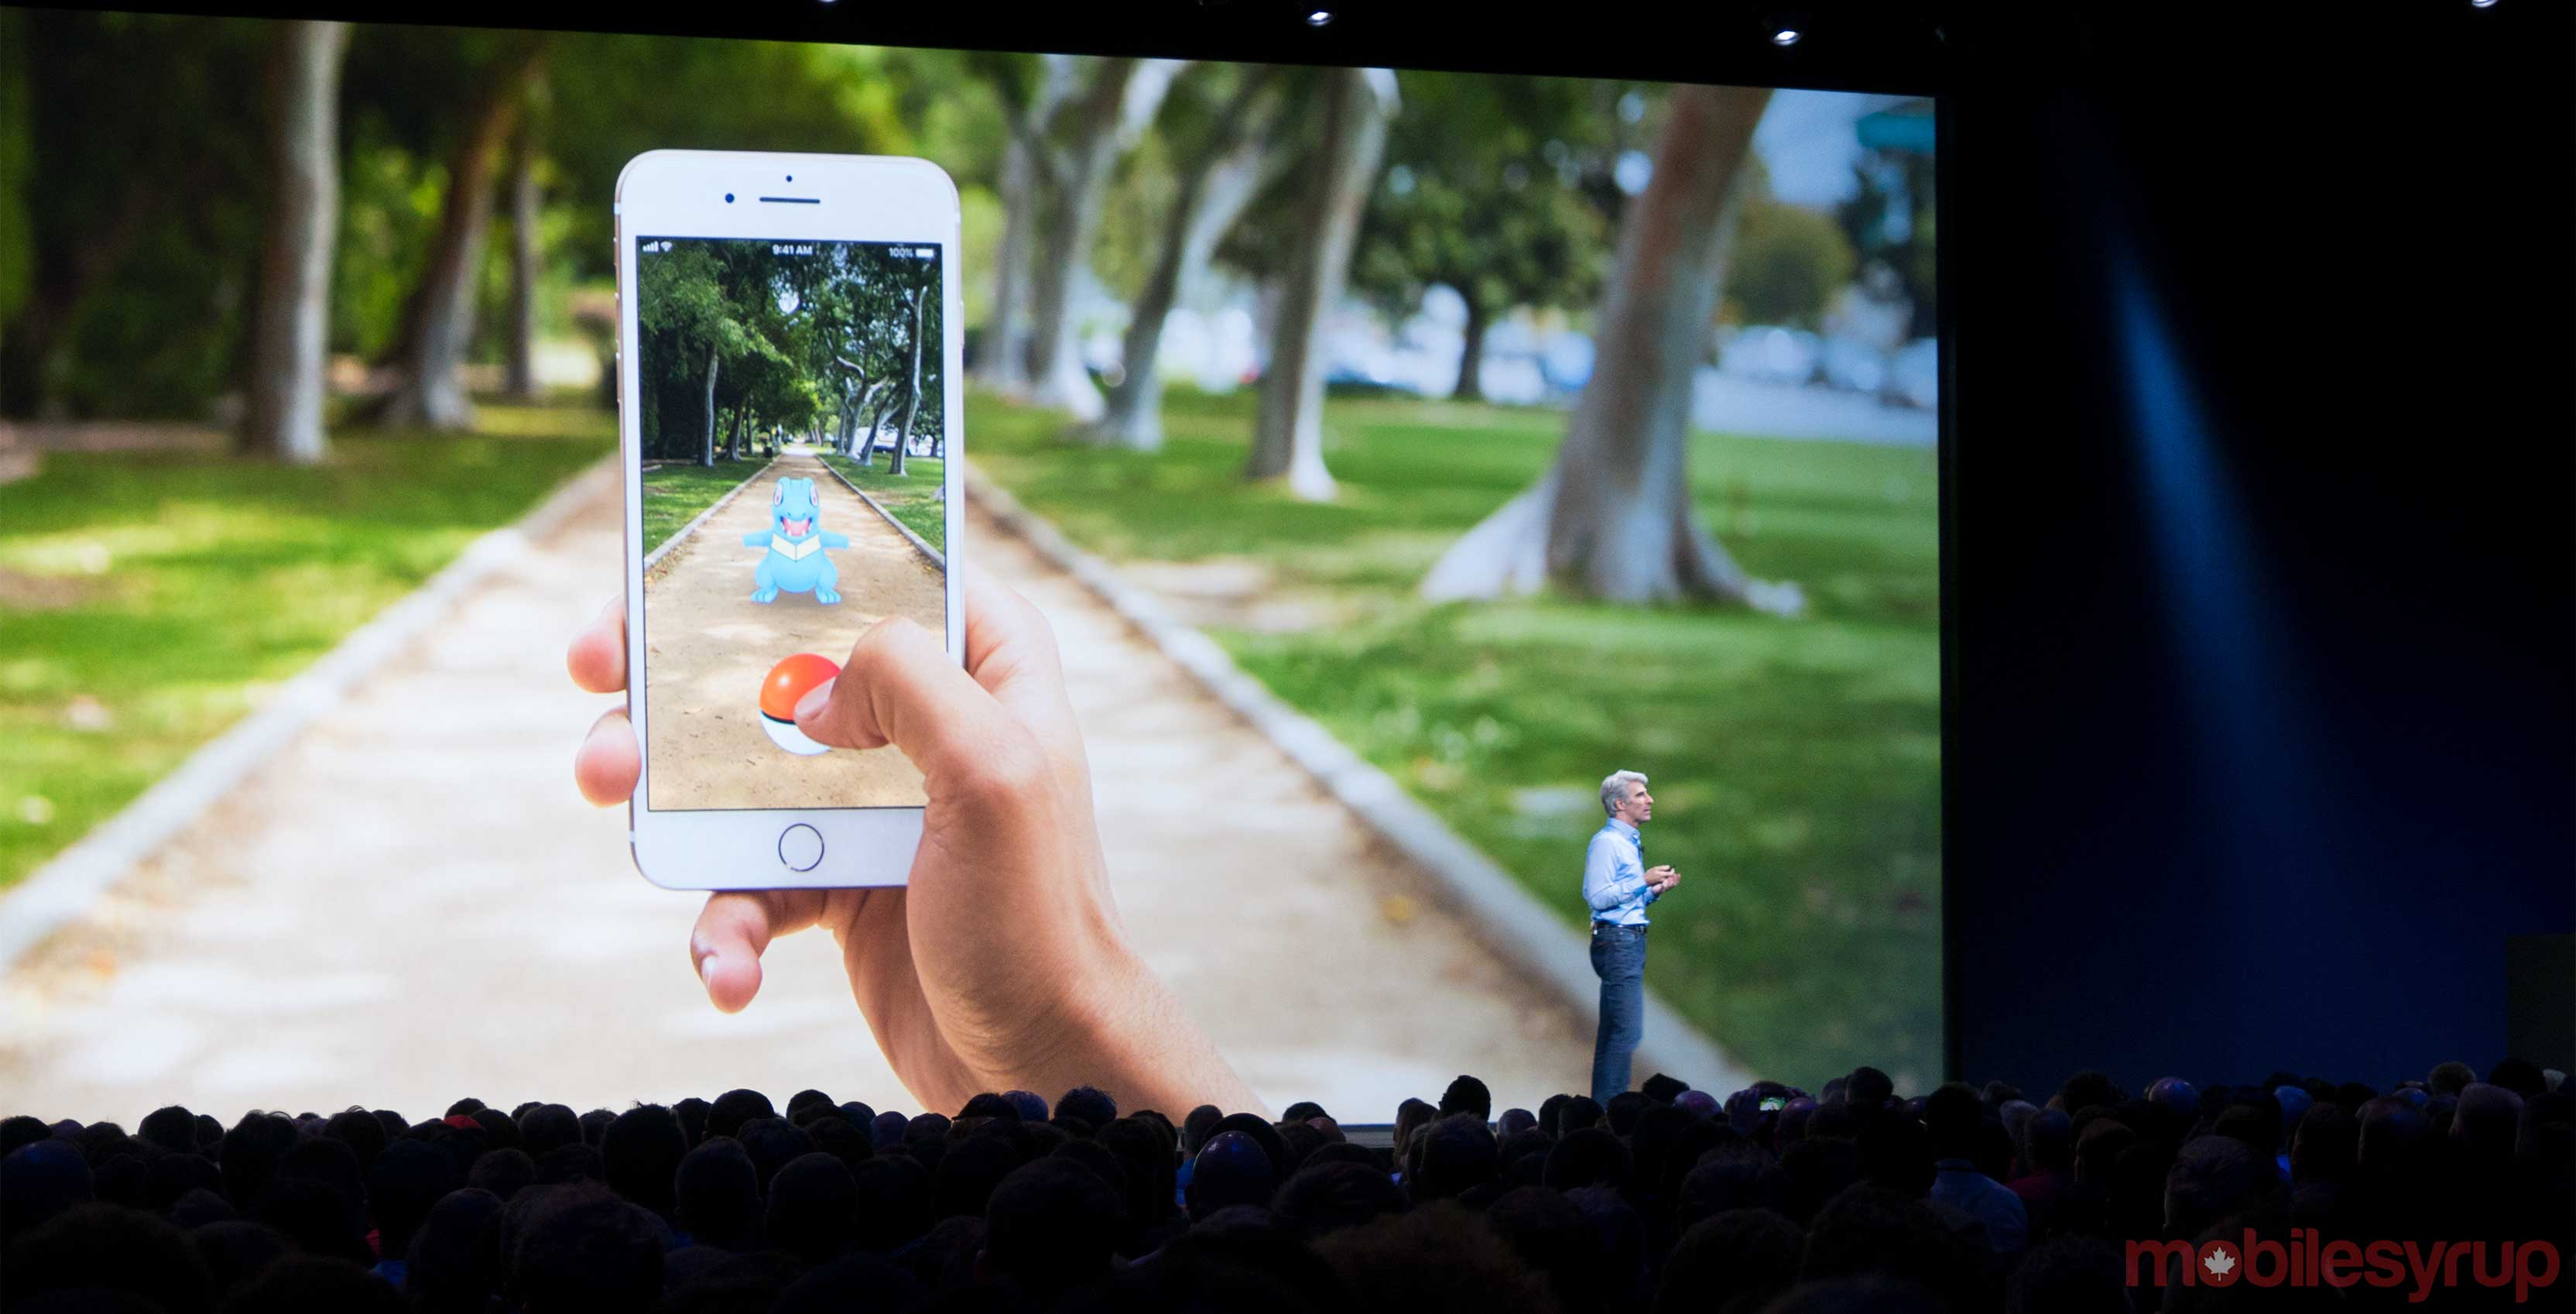 Pokemon GO taking advantage of Apple's new ARKit